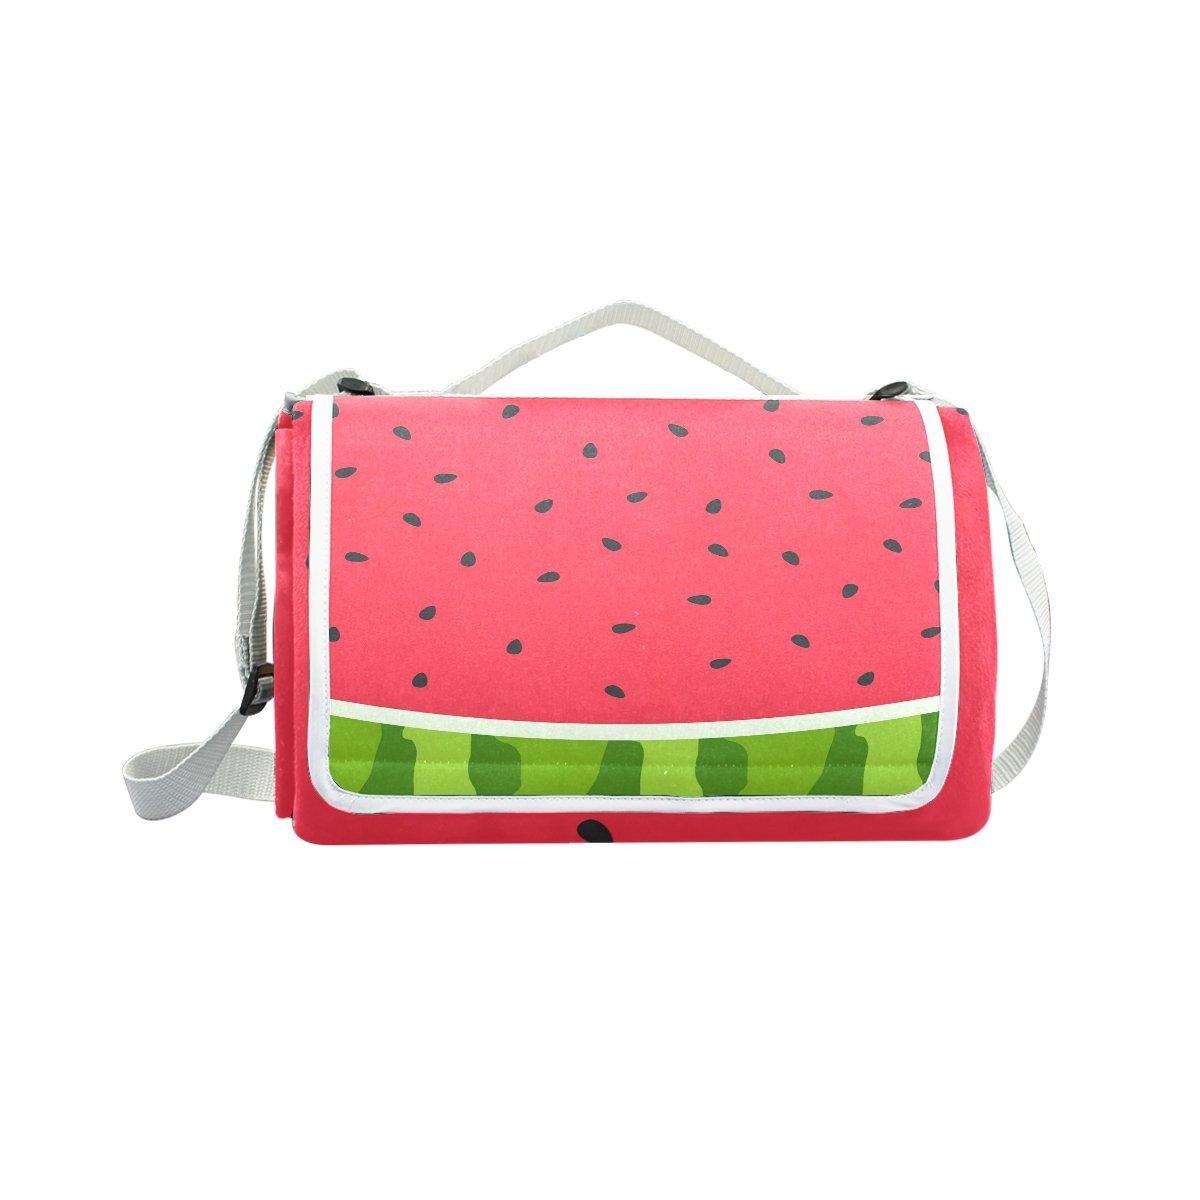 My Little Nest Outdoor Camping Picnic Beach Blanket Mat Watermelon Slice Lightweight Portable Folding Travel Pad 57'' x 59''